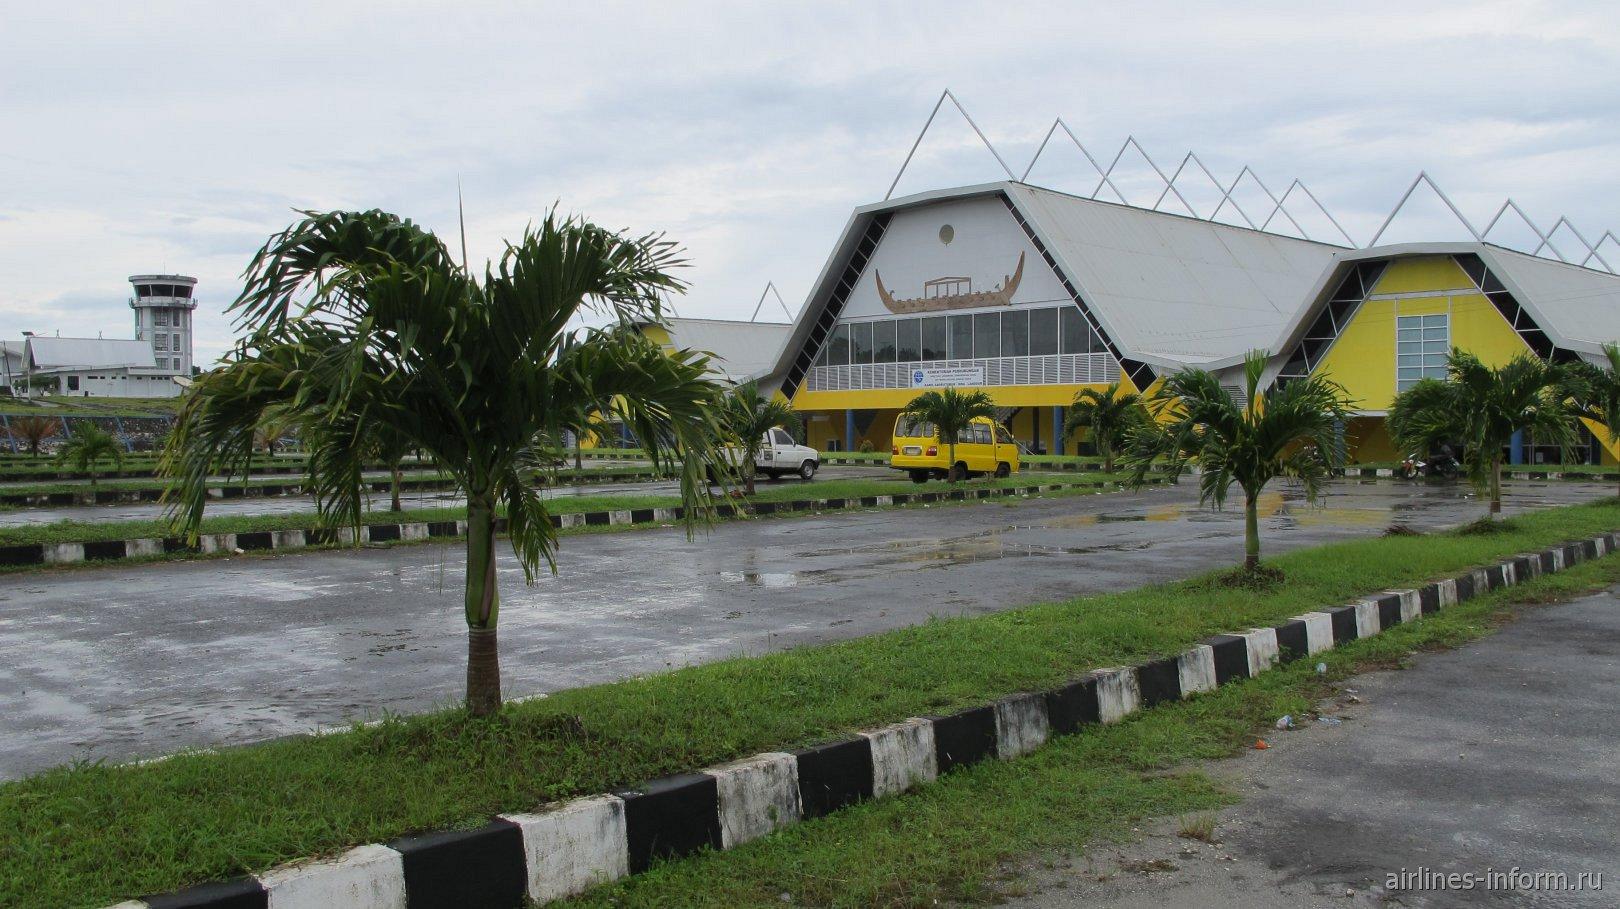 Привокзальная площадь аэропорта Лангур Карел Садсуйтубун